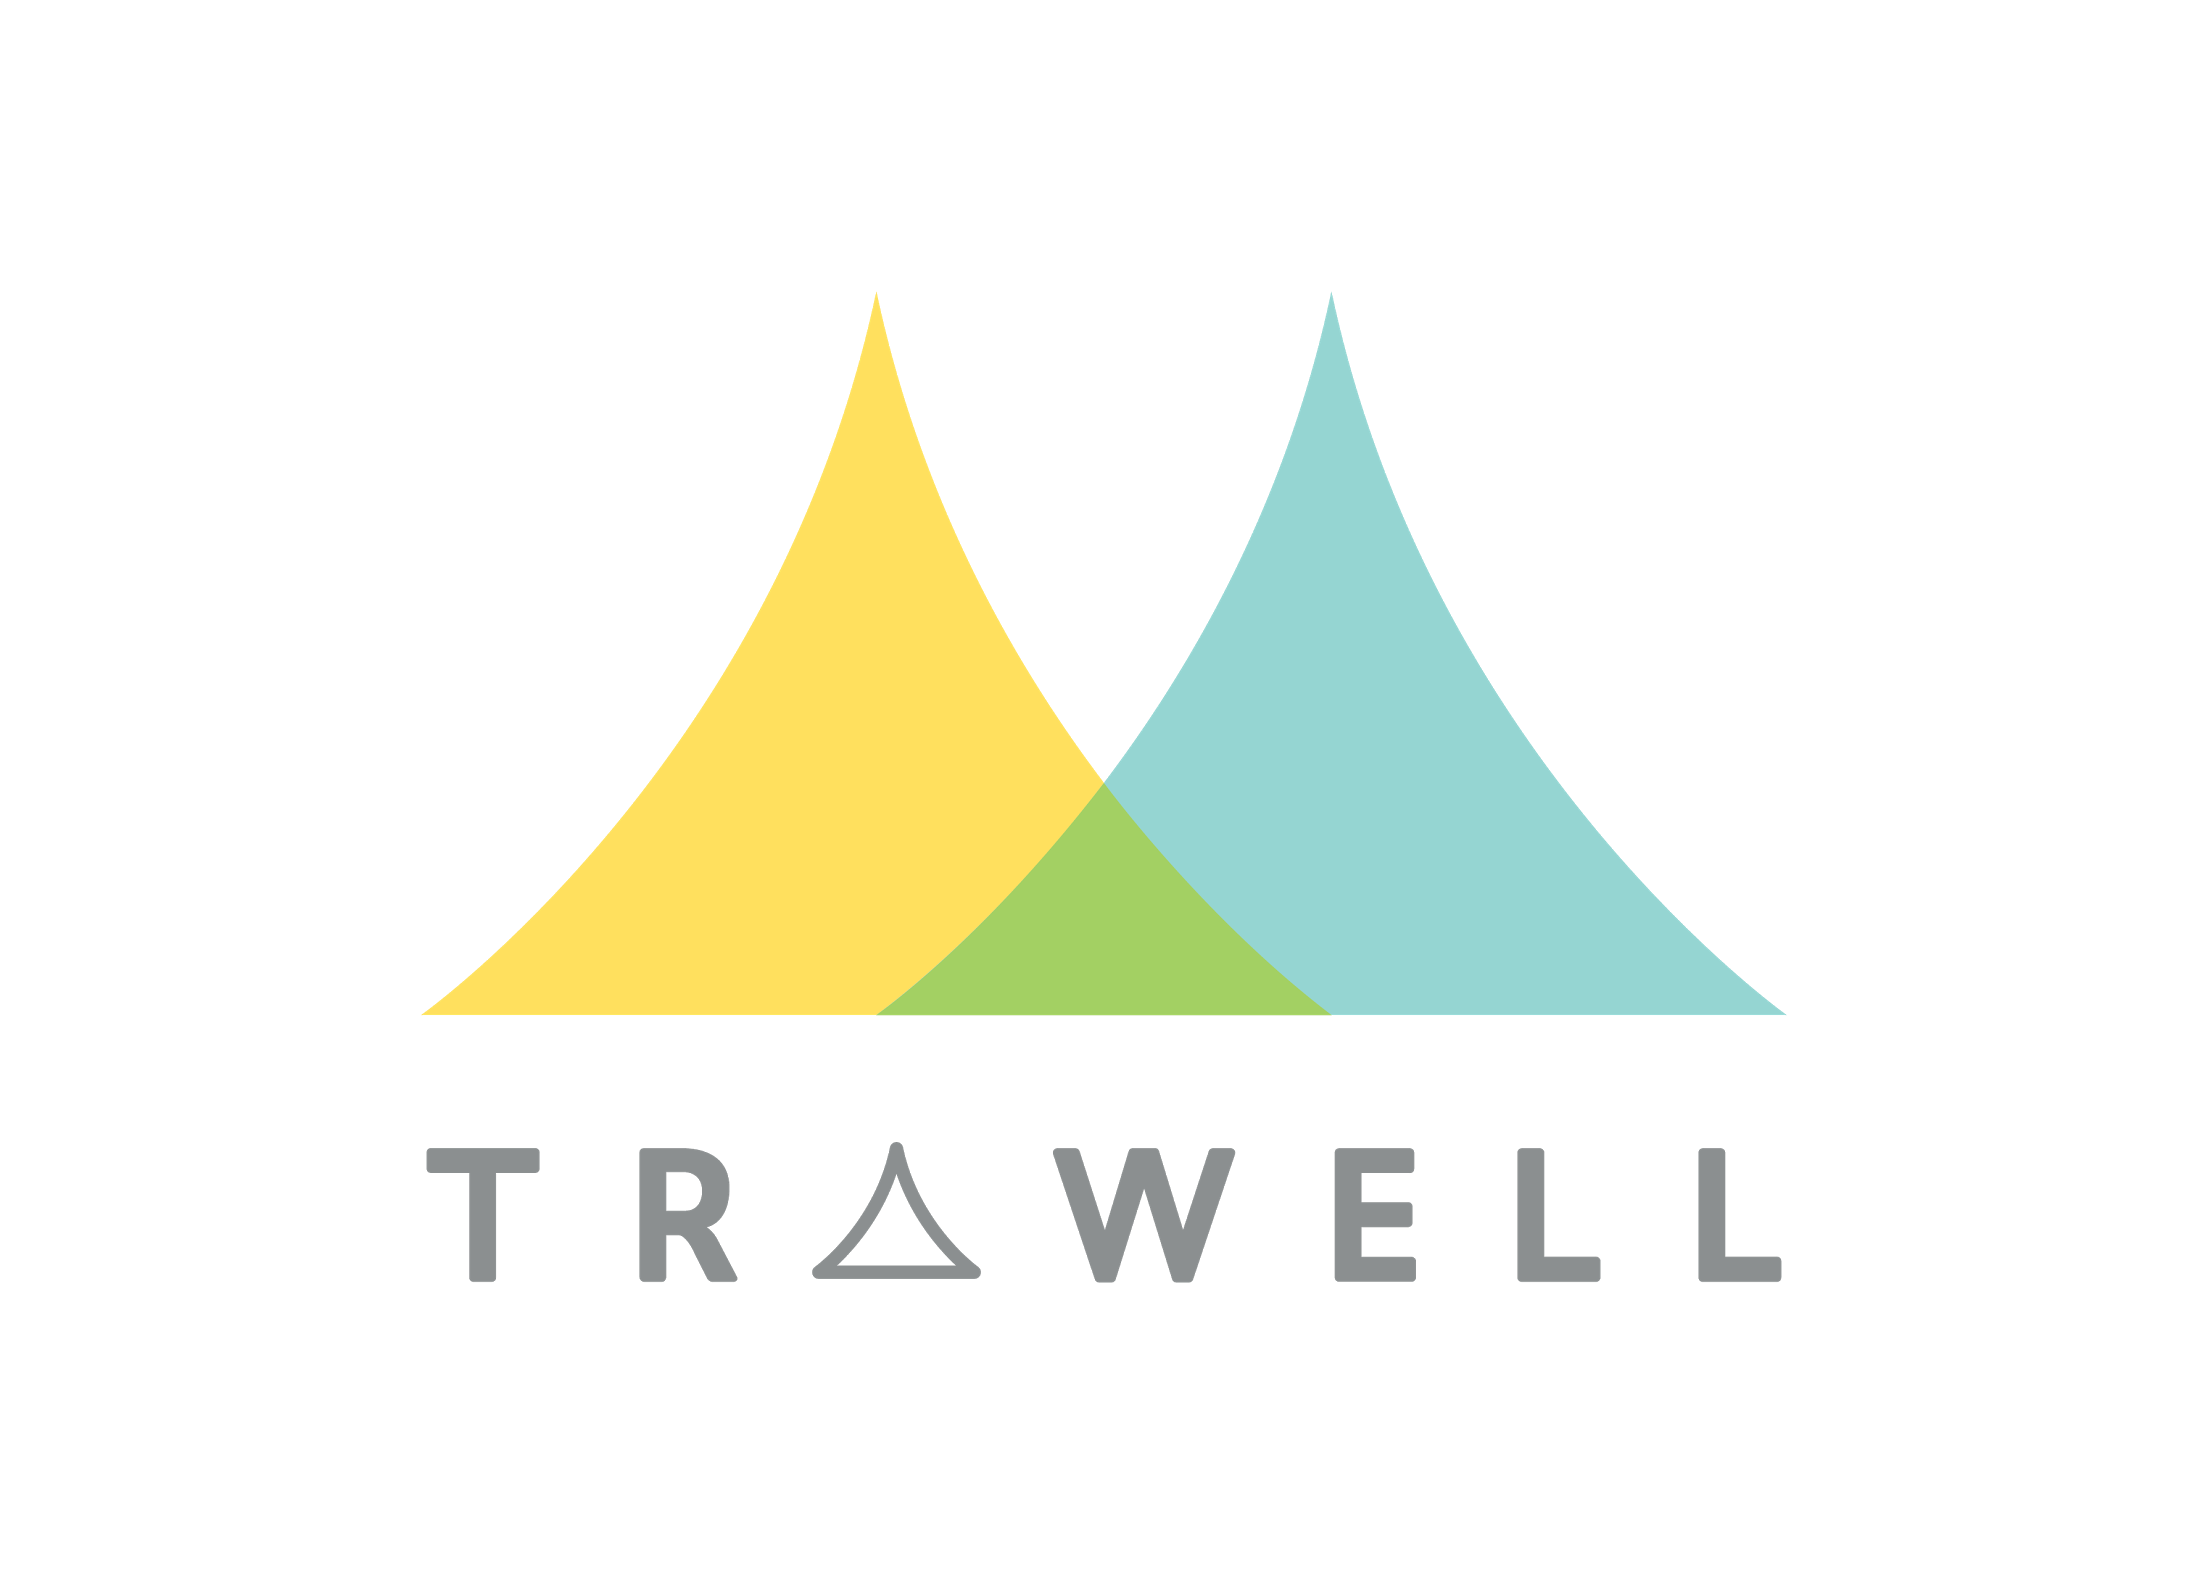 Trawell